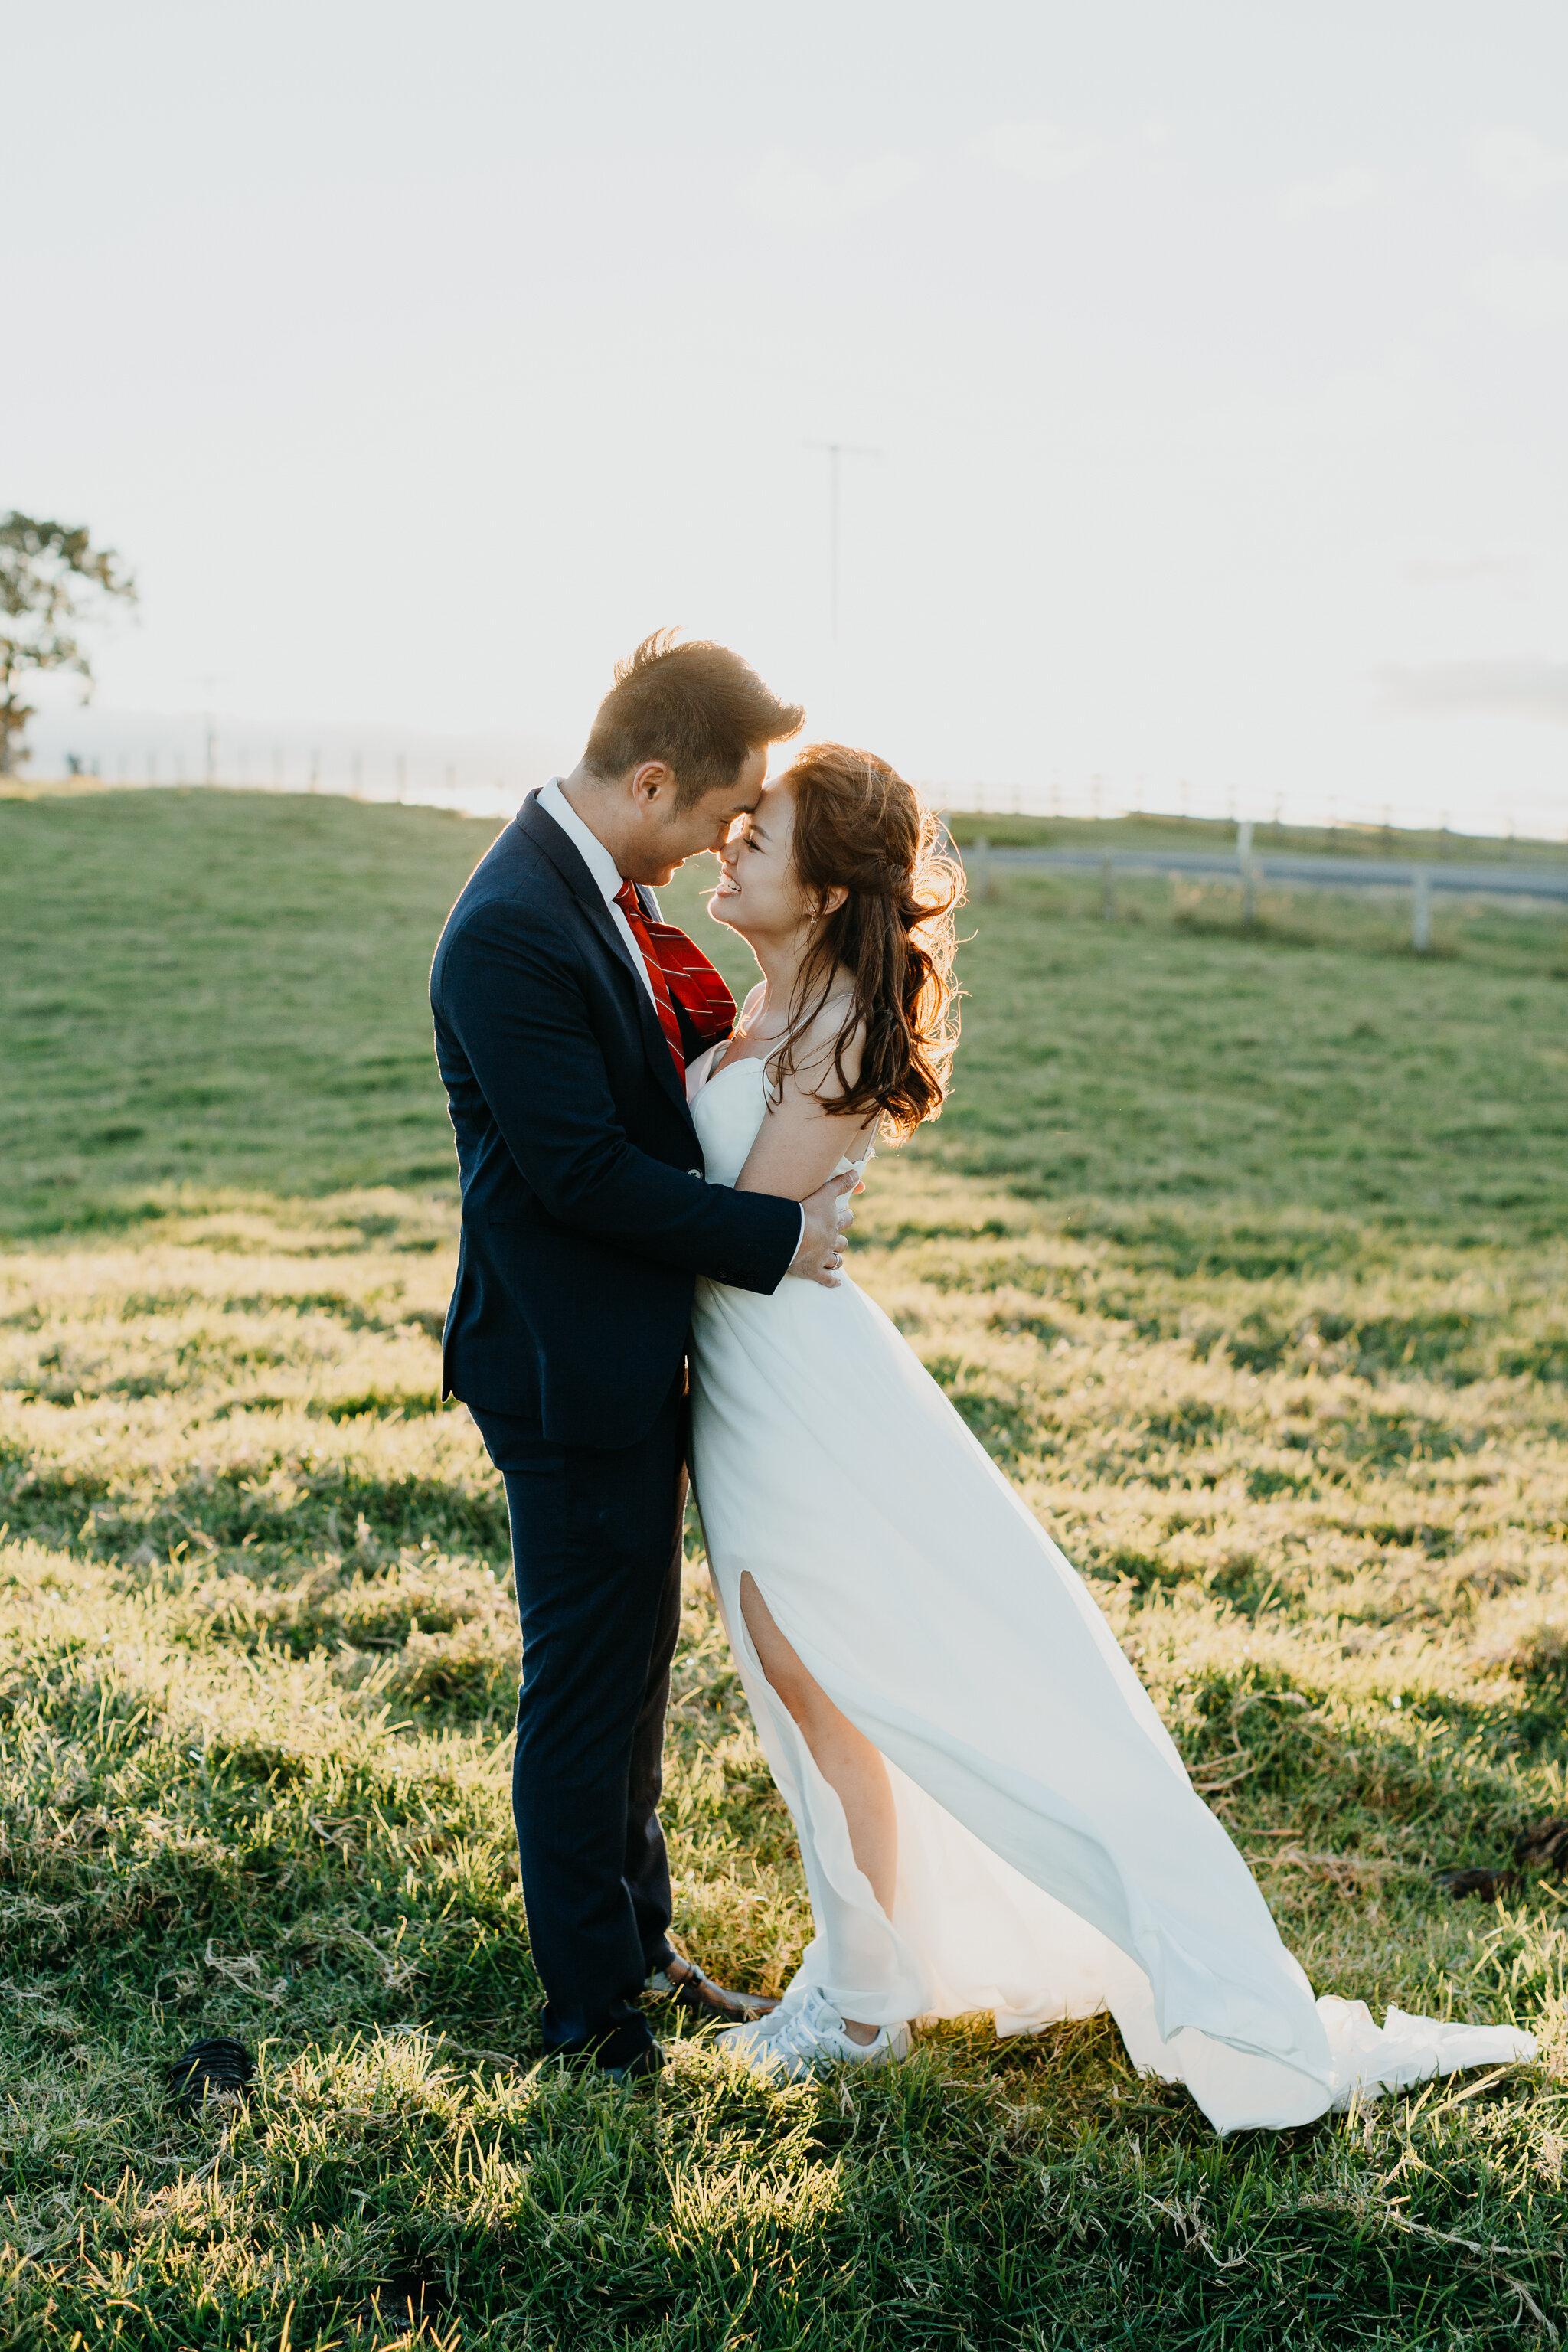 Maleny One Tree Hill Wedding - Maleny Wedding Photographer-23.jpg